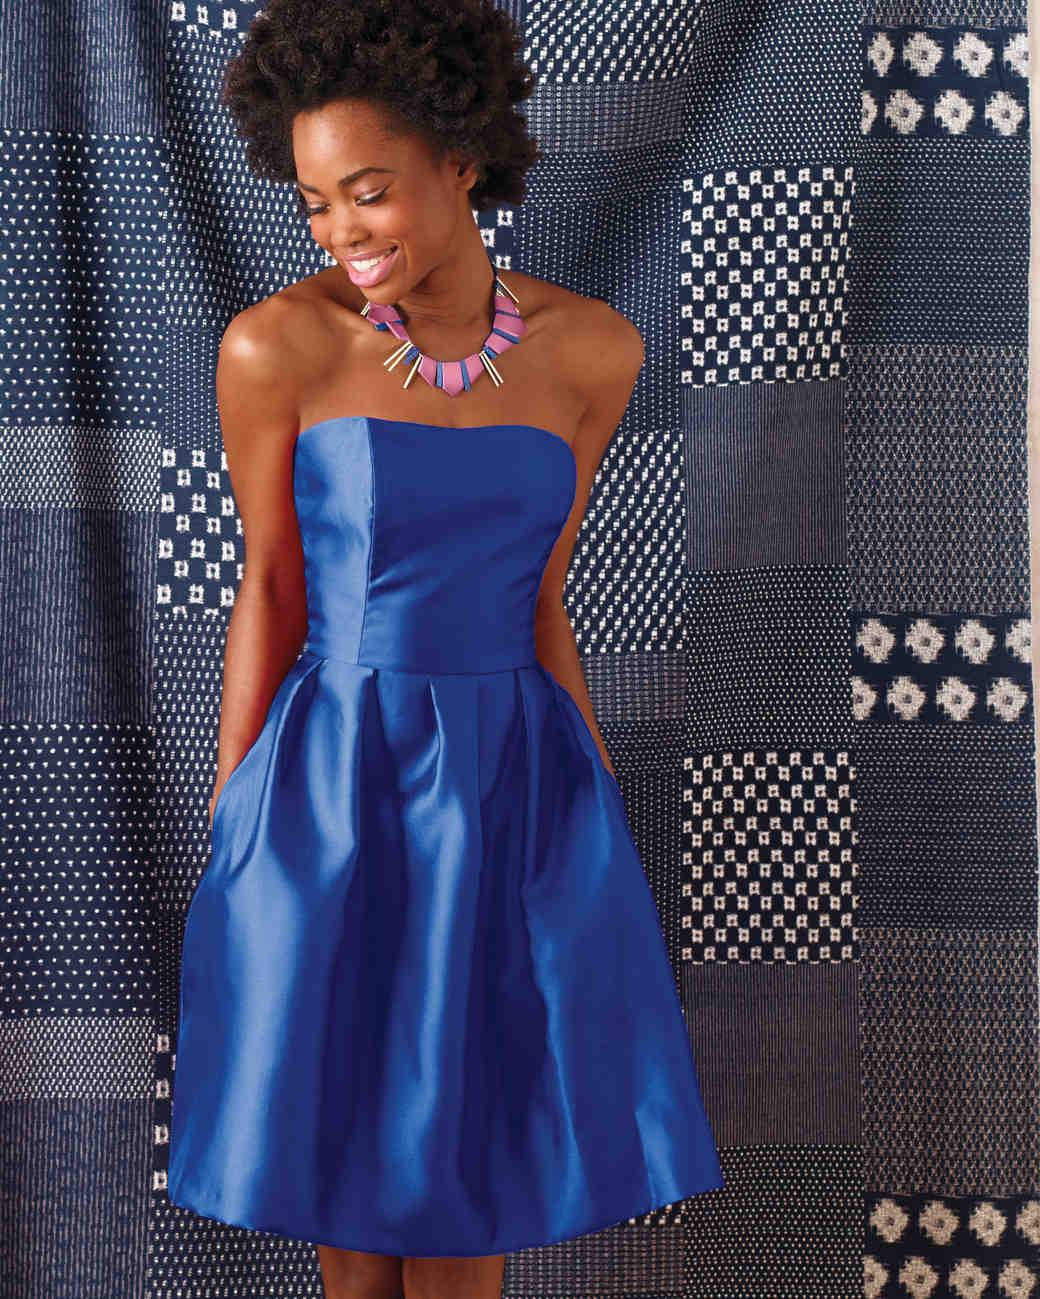 bridesmaid-model-02122-mwd110739.jpg